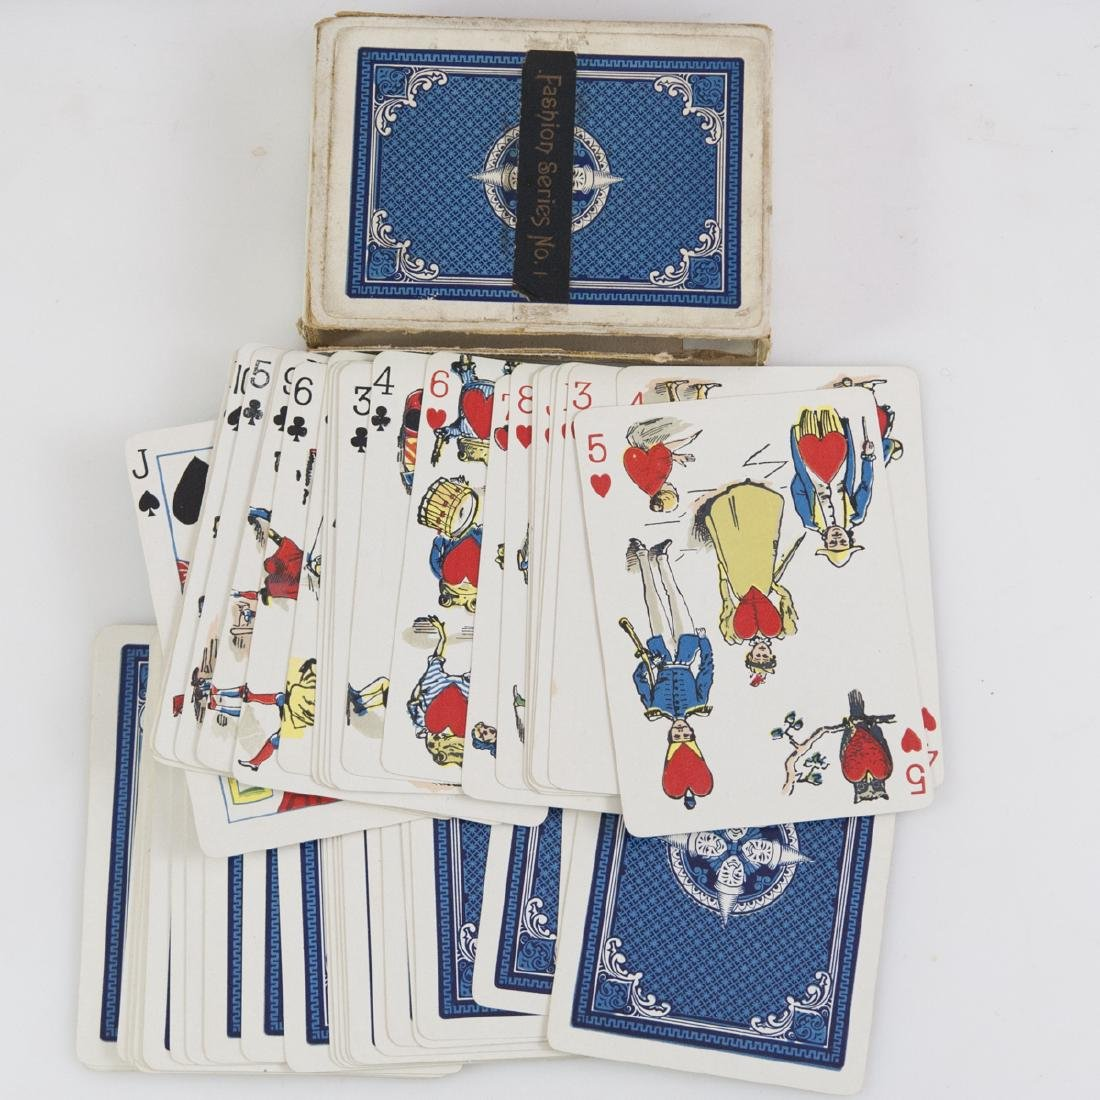 1895 Vanity Fair No.41 Playing Card Deck - 2